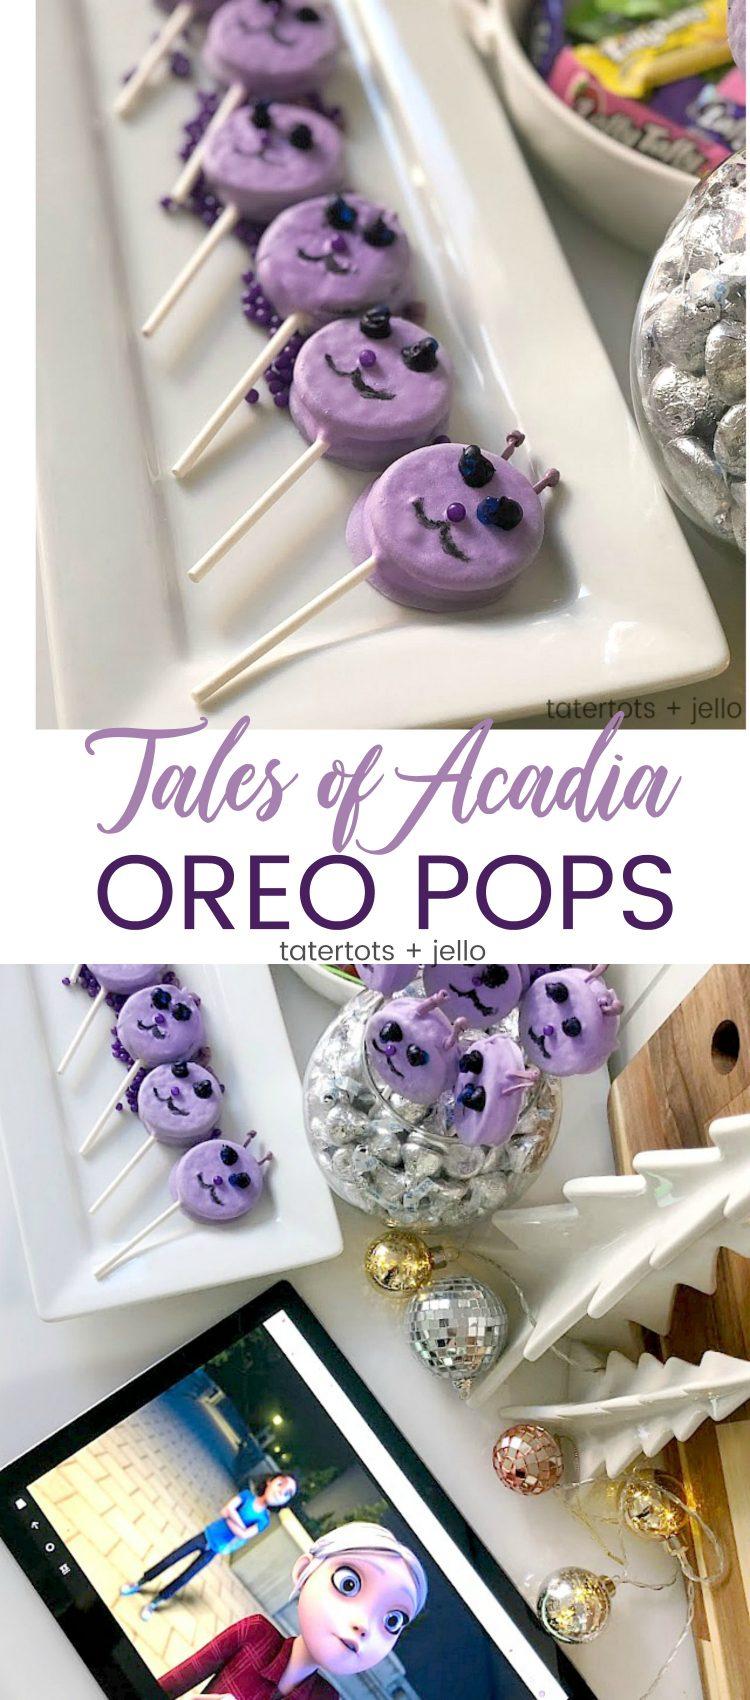 tales of acadia oreo pops tutorial